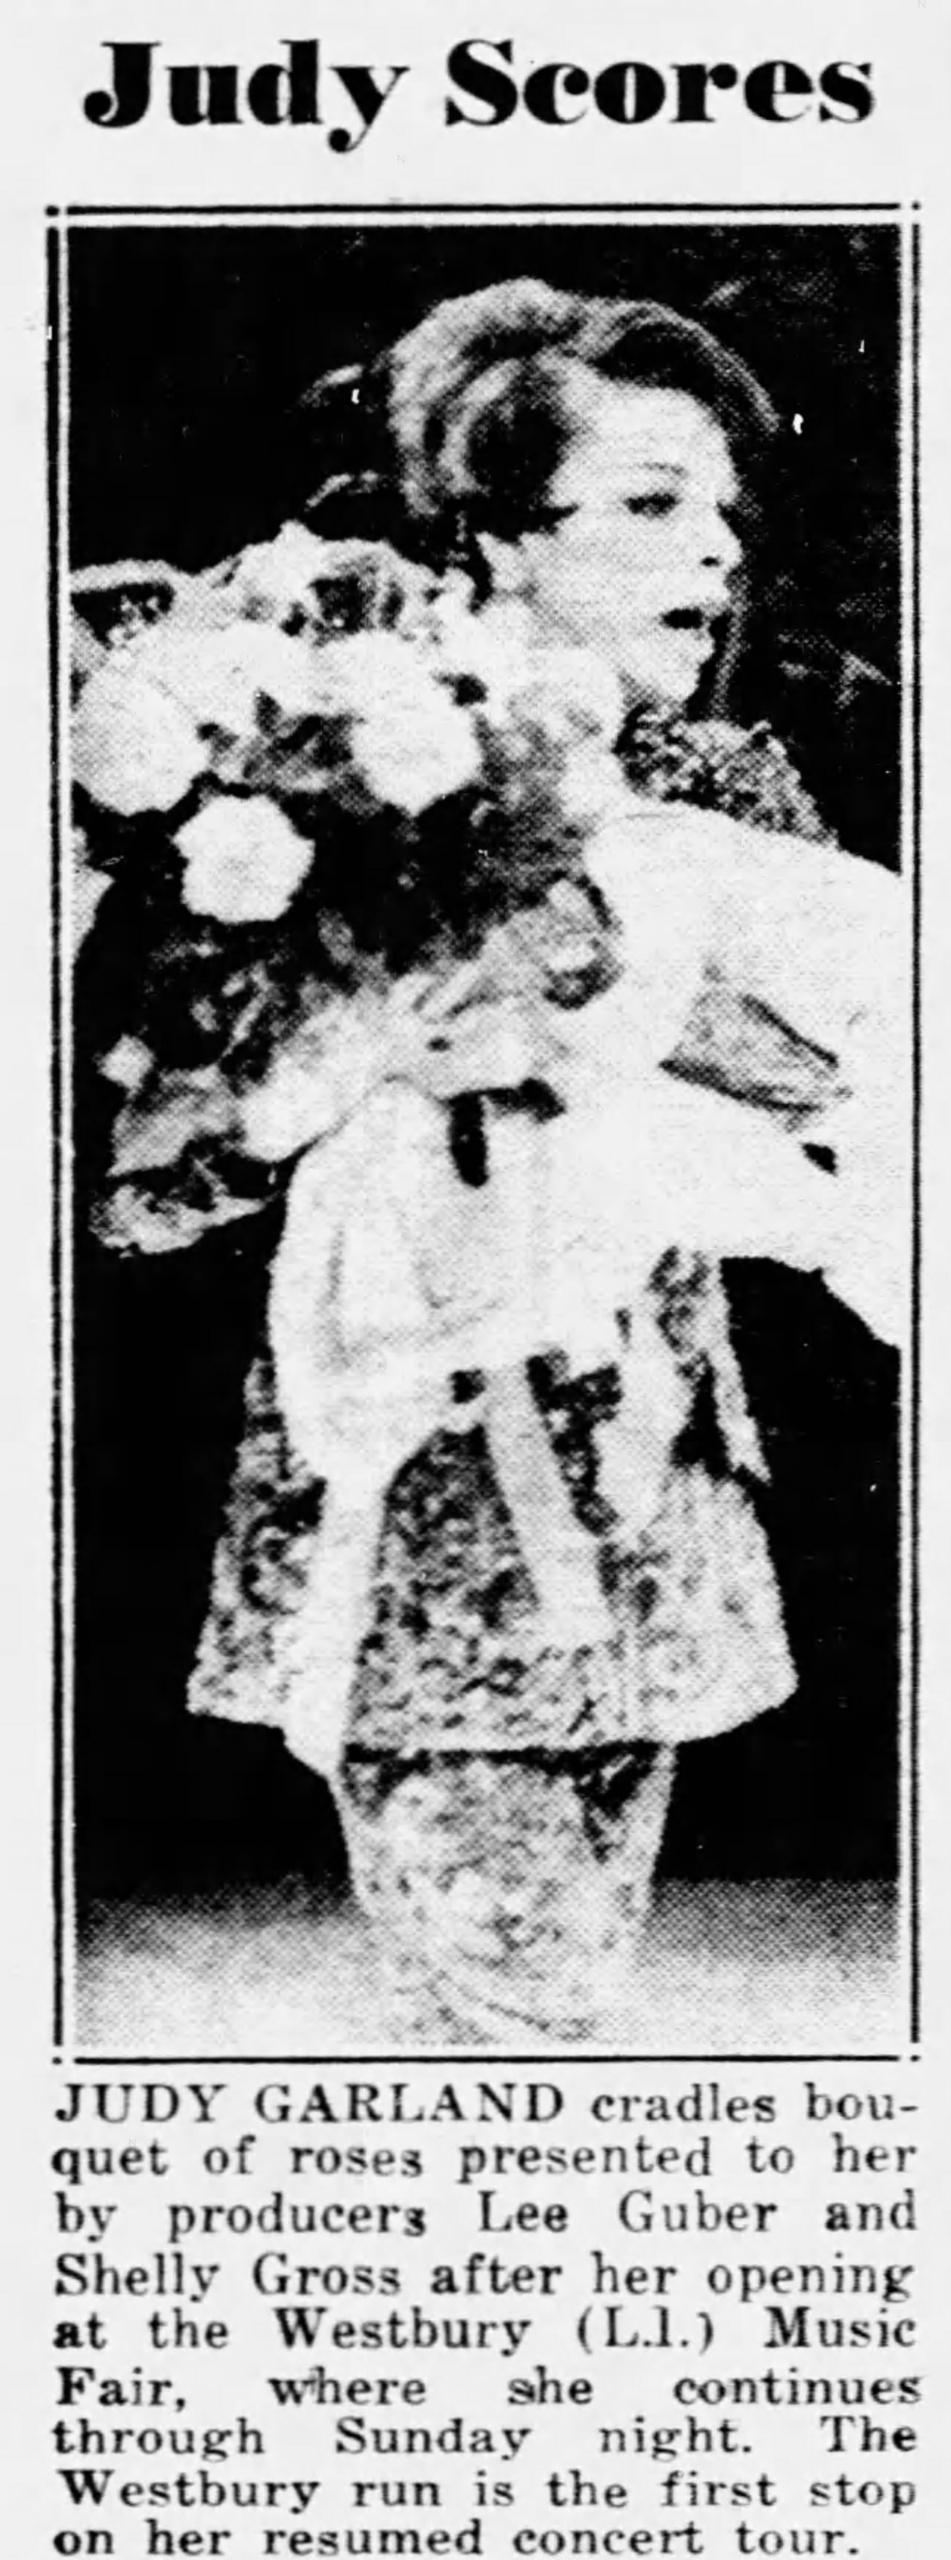 Judy Garland at Westbury